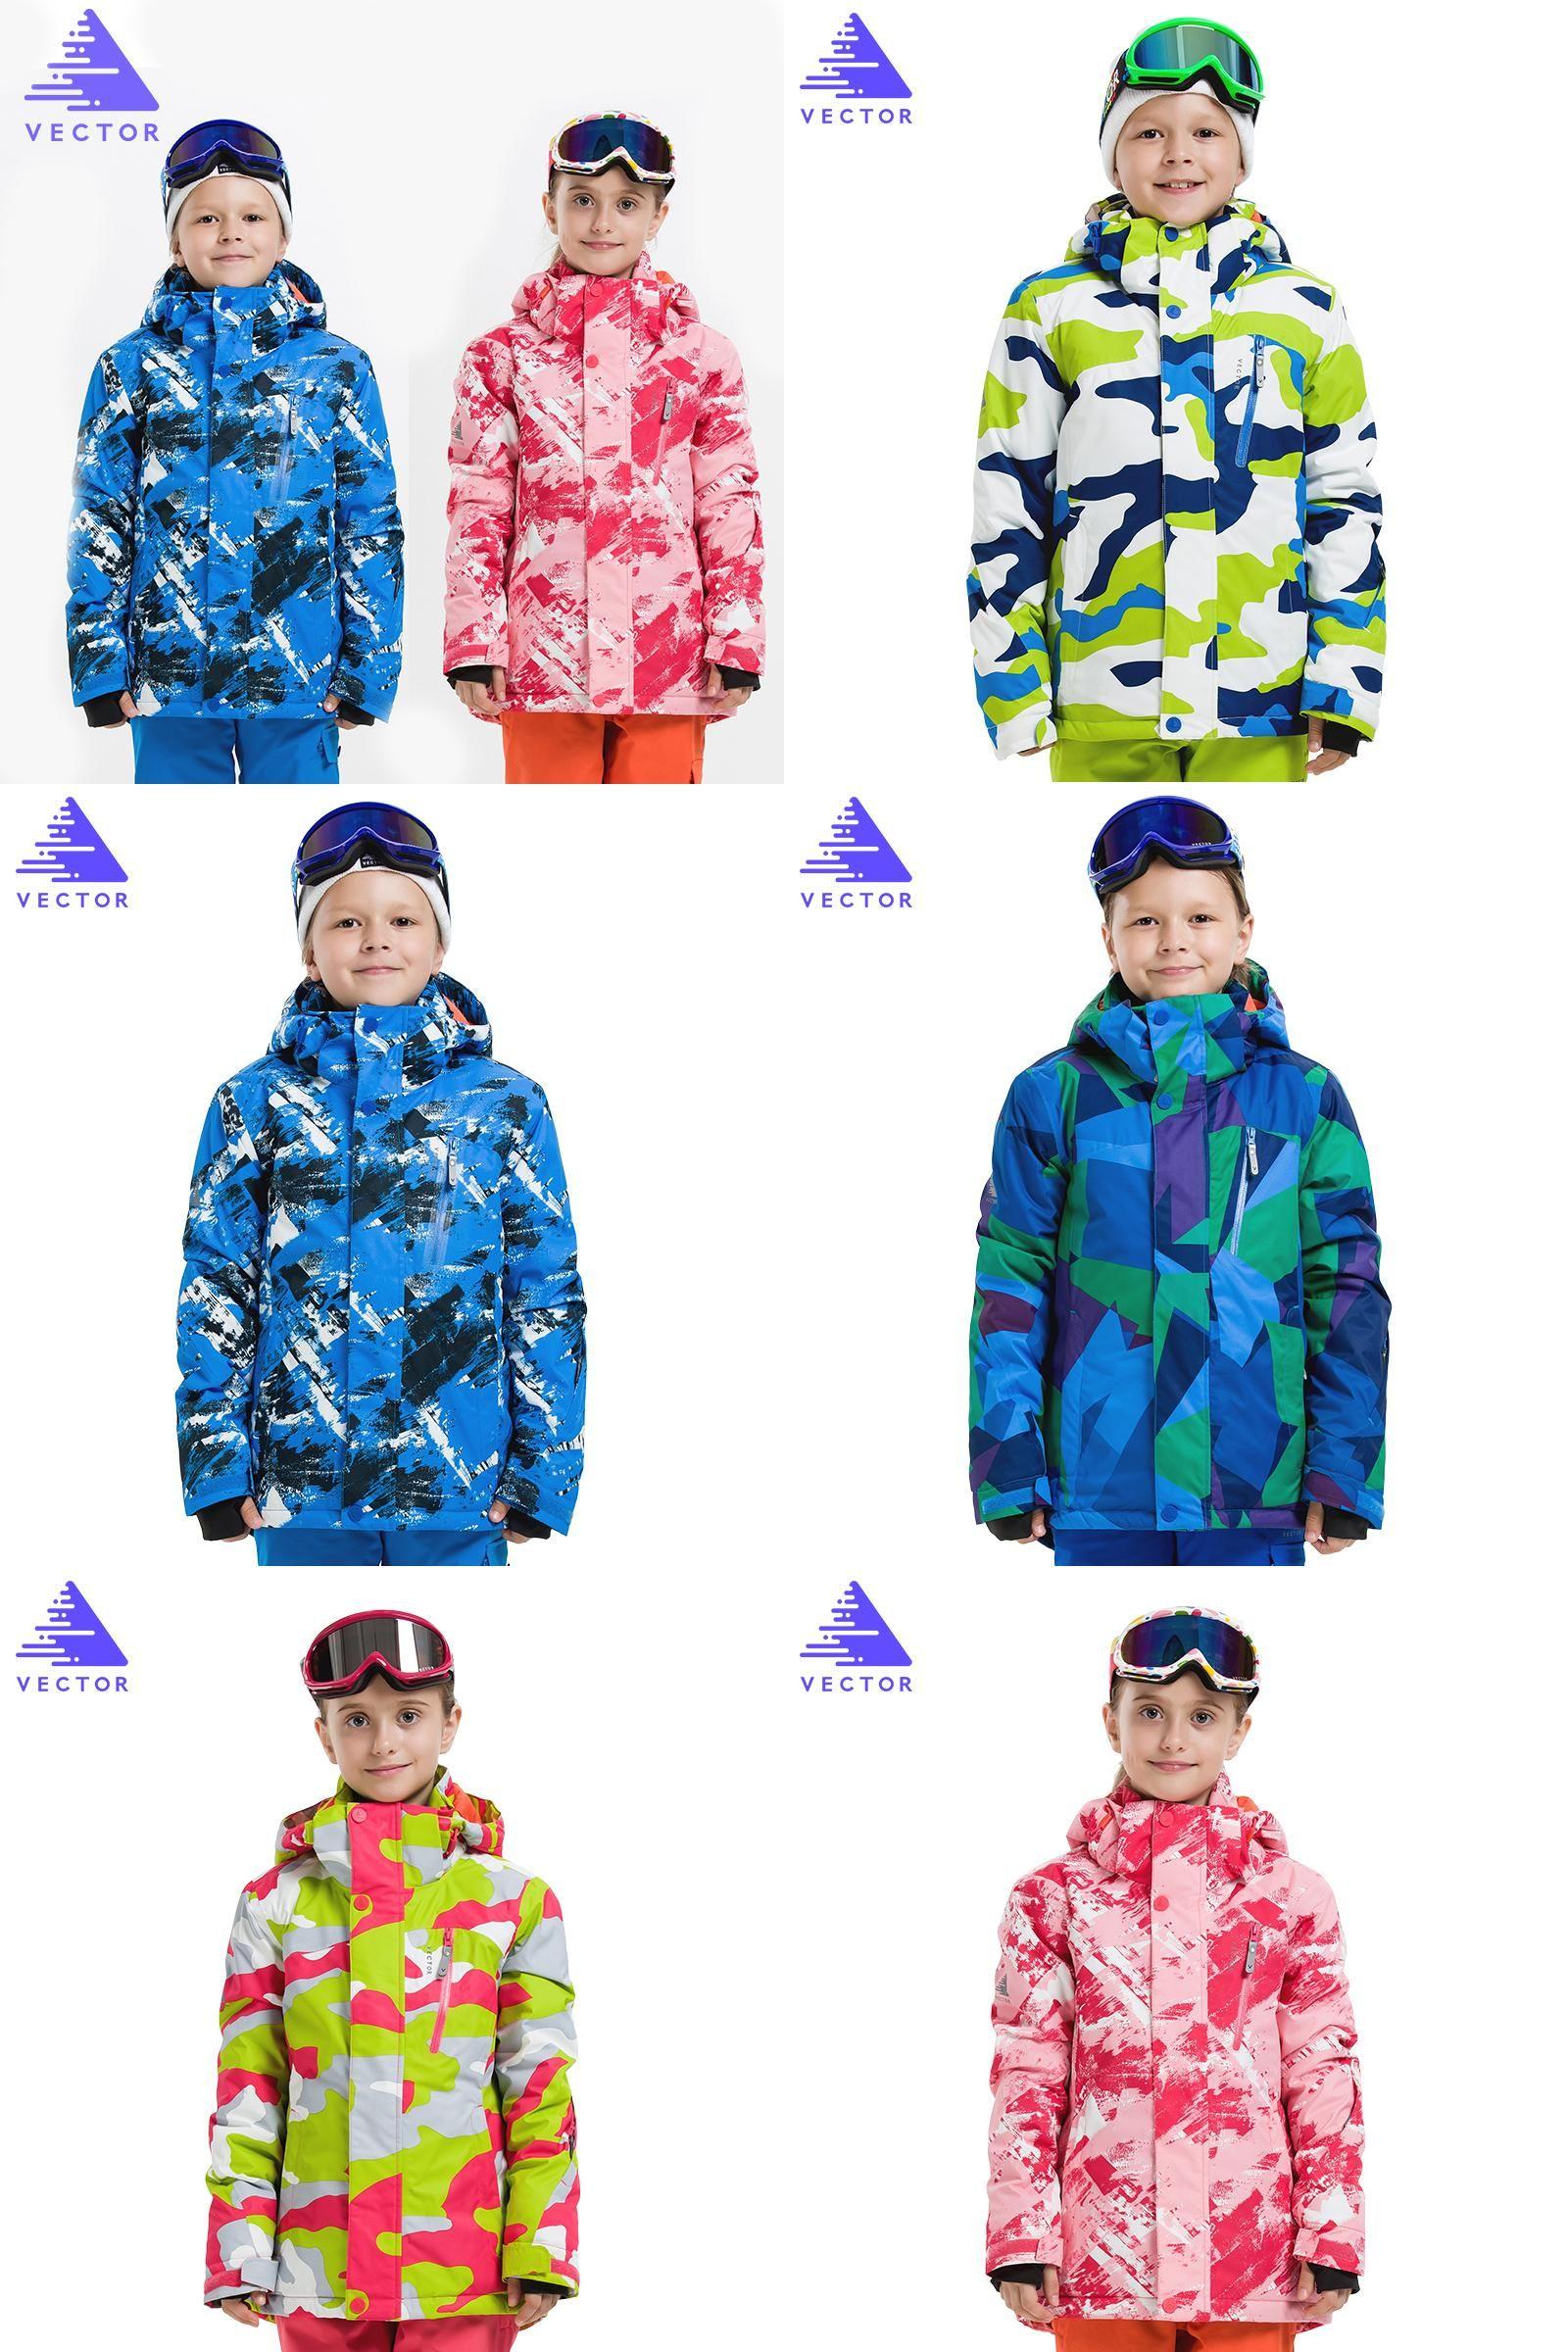 60ebeb860 Visit to Buy  VECTOR Professional Child Ski Jackets Winter Warm ...